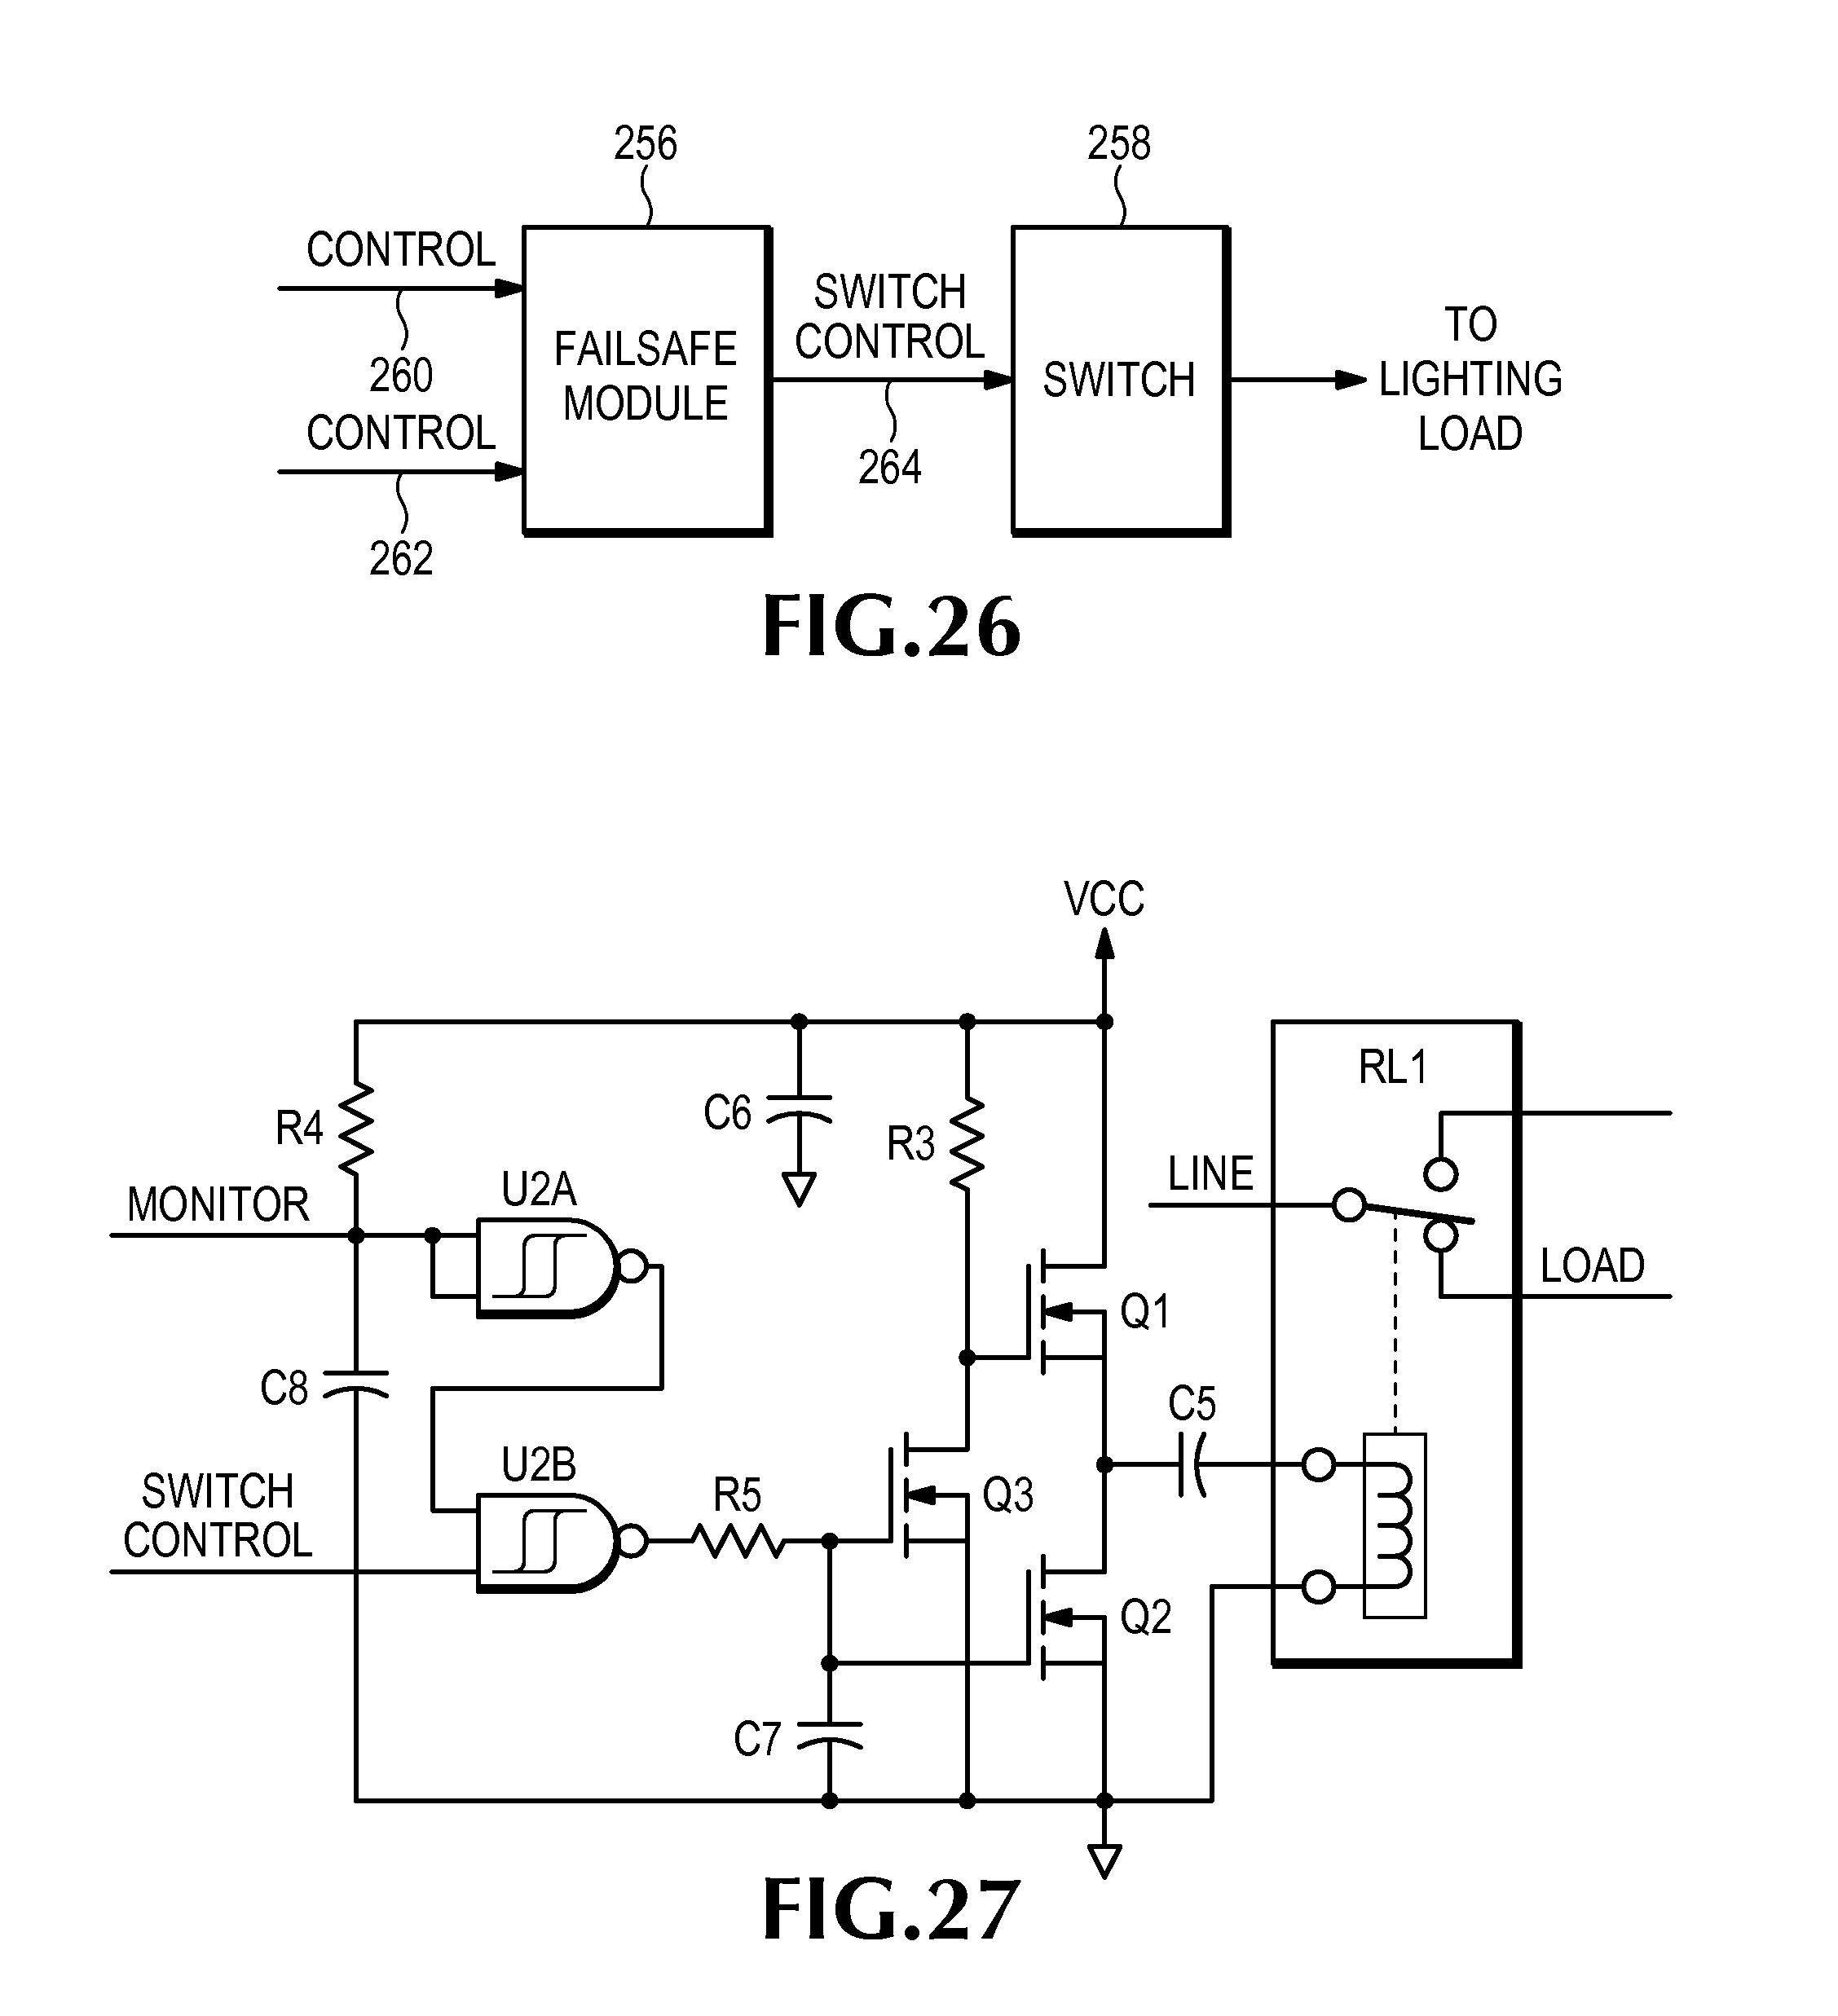 Novitas Occupancy Sensor Wiring Diagram Schematics Diagrams Double Switch Lutron Wattstopper Cell Phone 3 Way Leviton